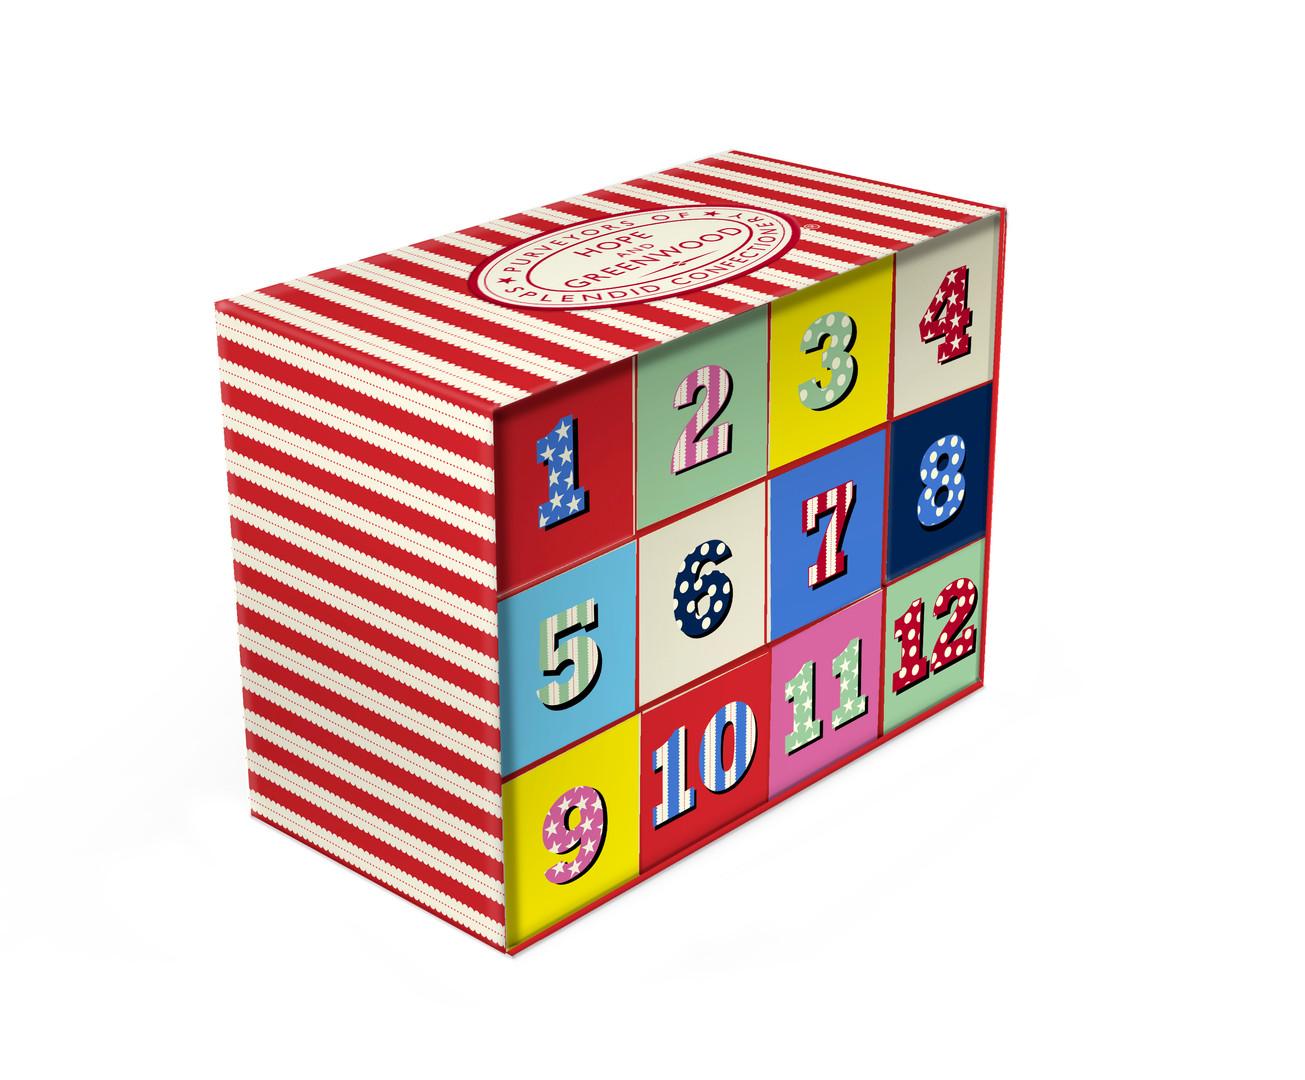 Advert calender gift box